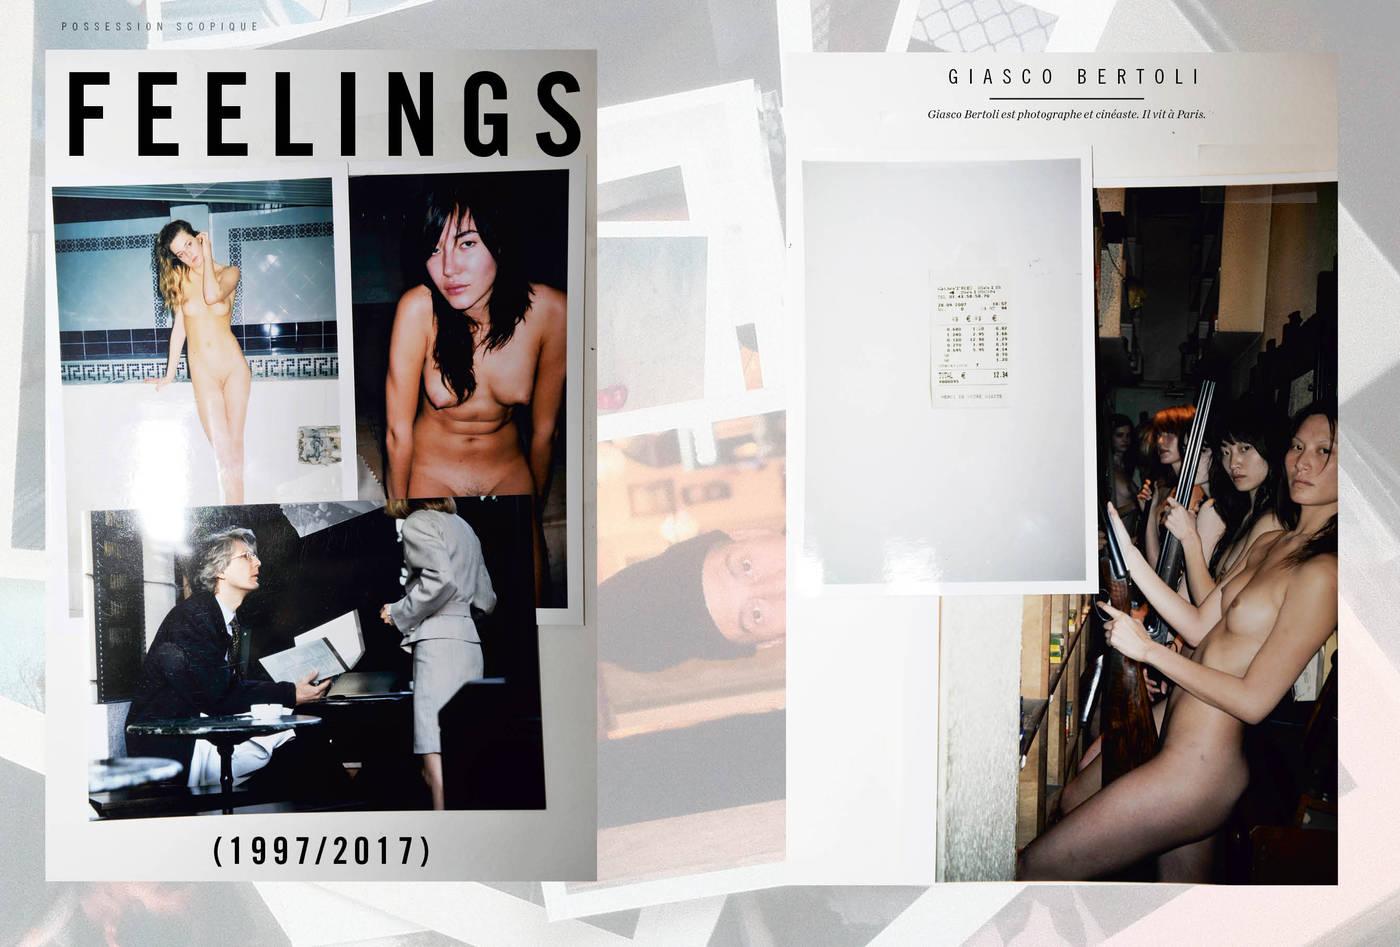 Photographies de Giasco Bertoli, Feelings